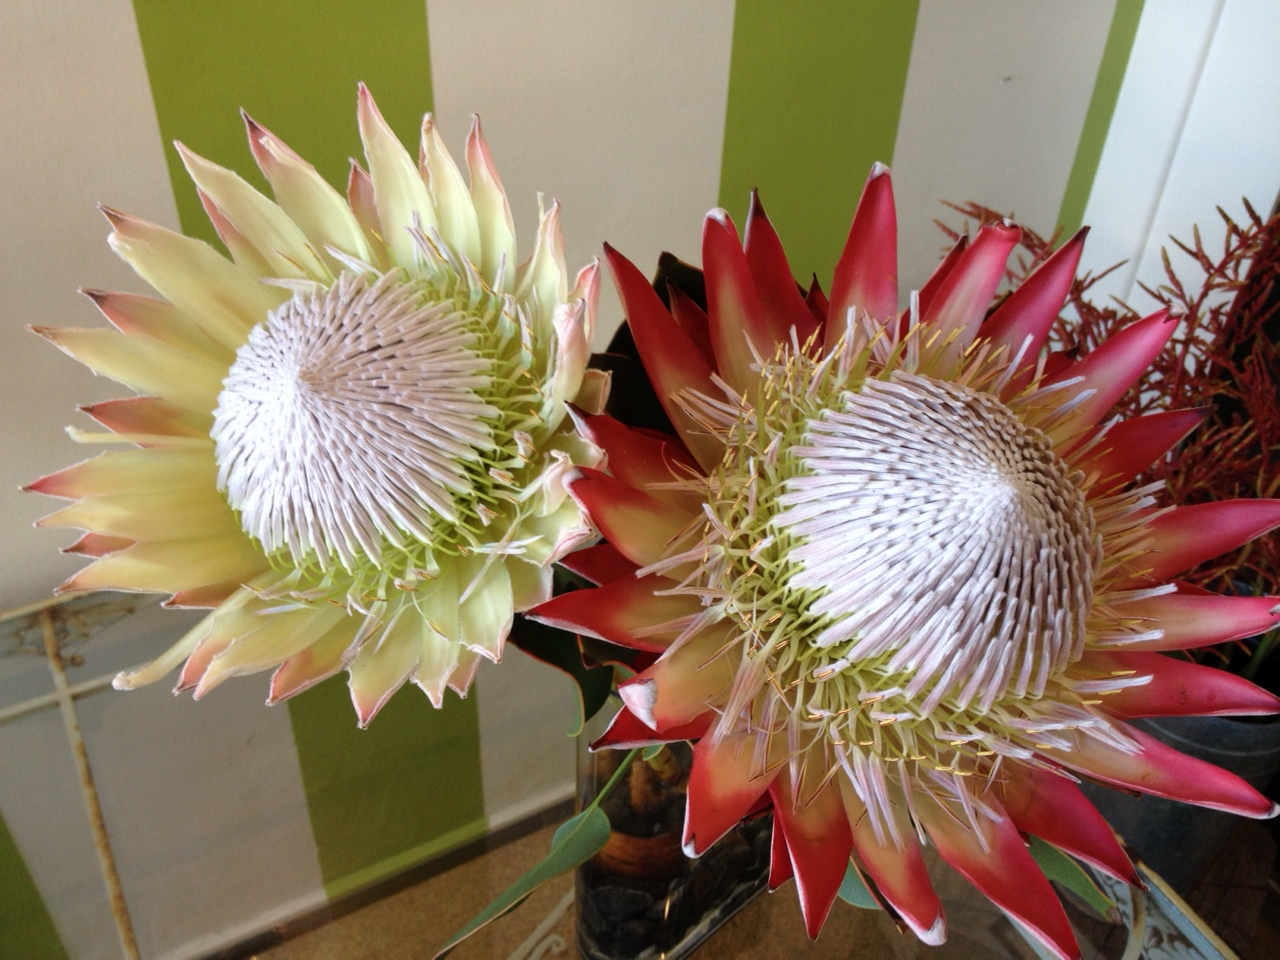 Floral arrangements corona del mar florist for King protea flower arrangements